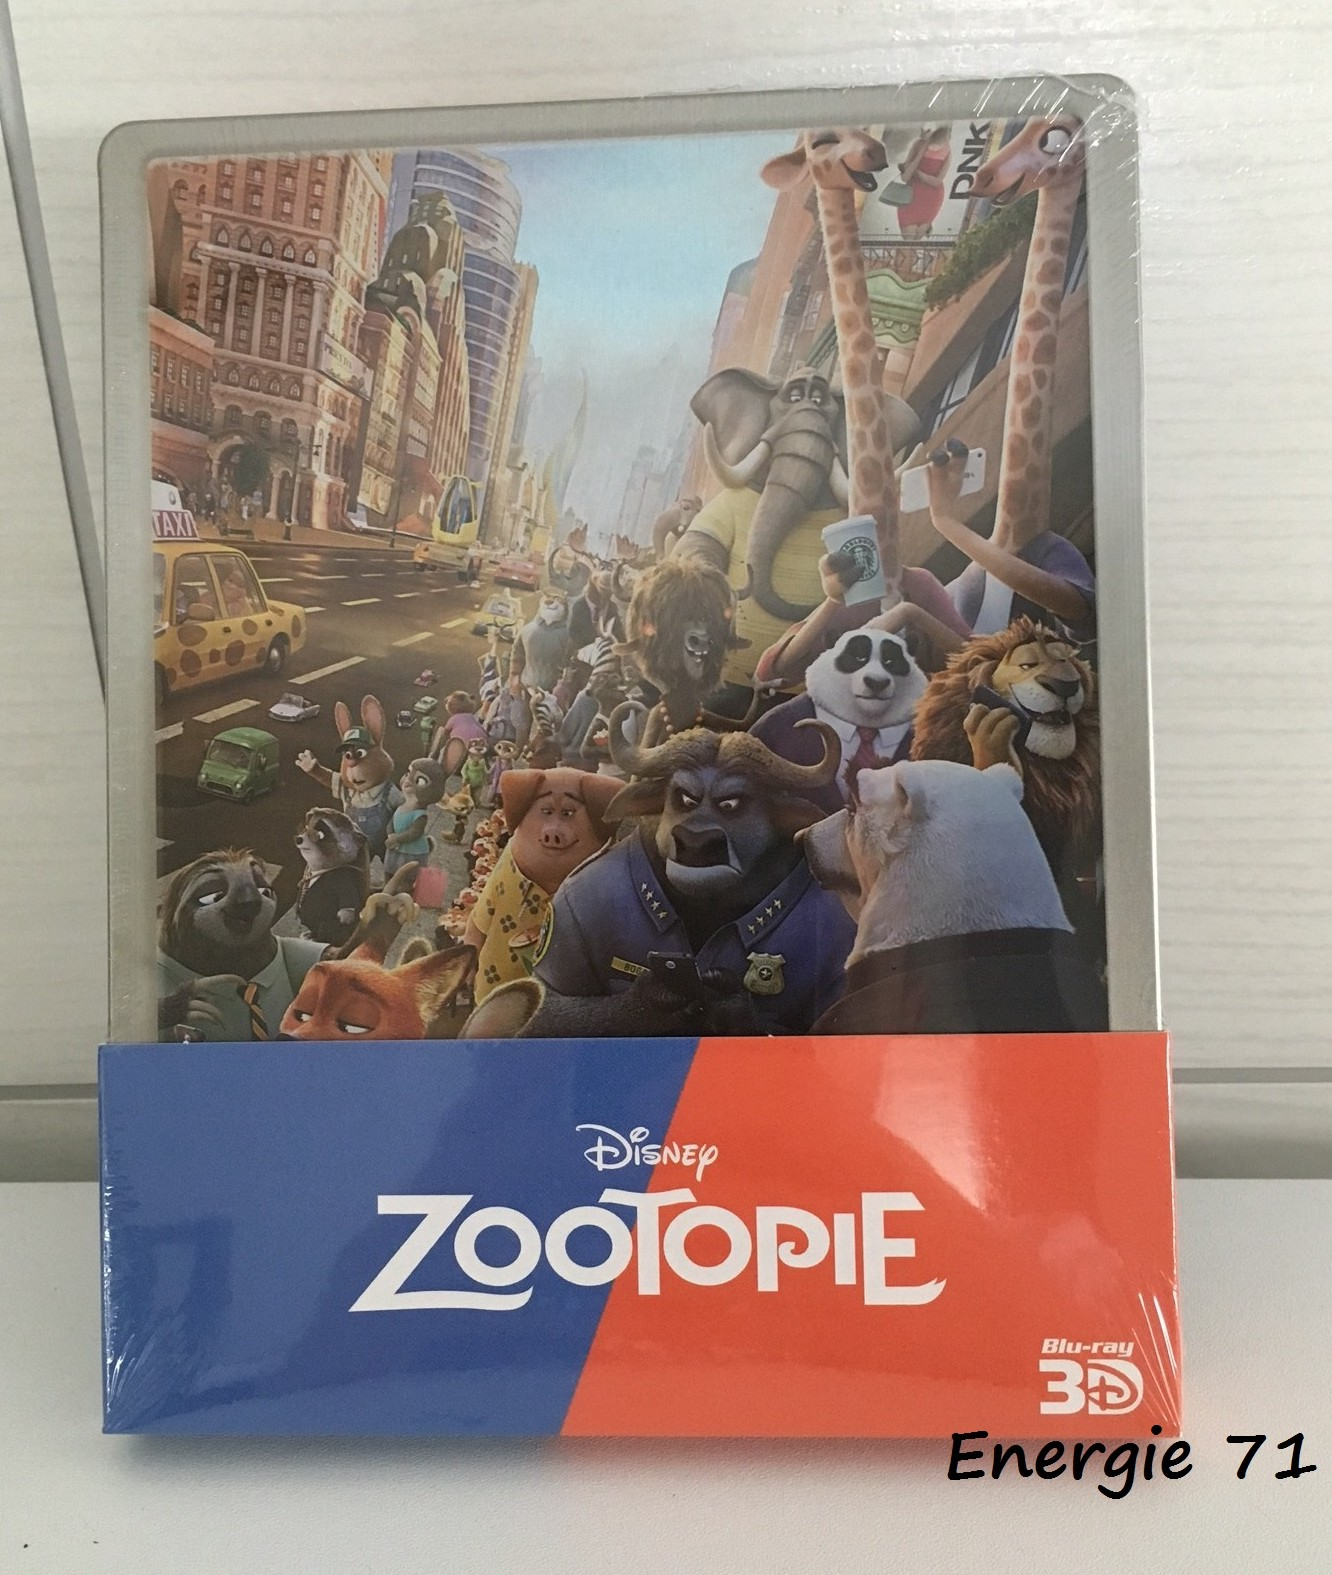 [BD + 3D + DVD] Zootopie (29 Juin 2016)  - Page 5 160628055020146825